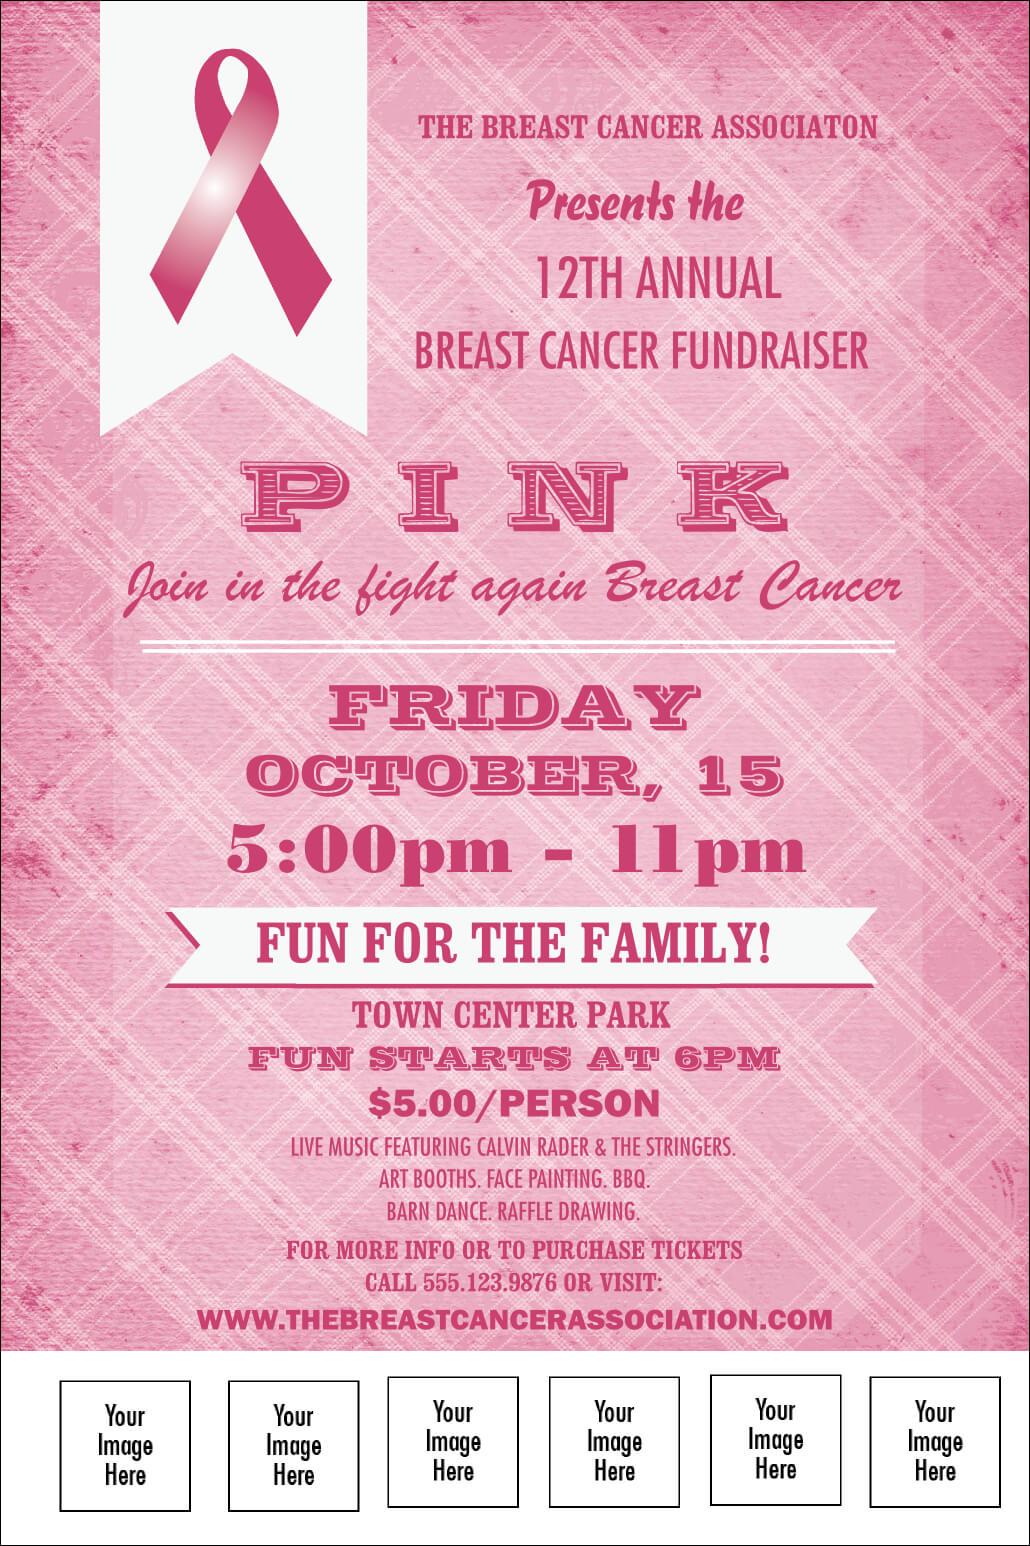 Breast Cancer Awareness Plaid Poster Inside Cancer Fundraiser Flyer Template